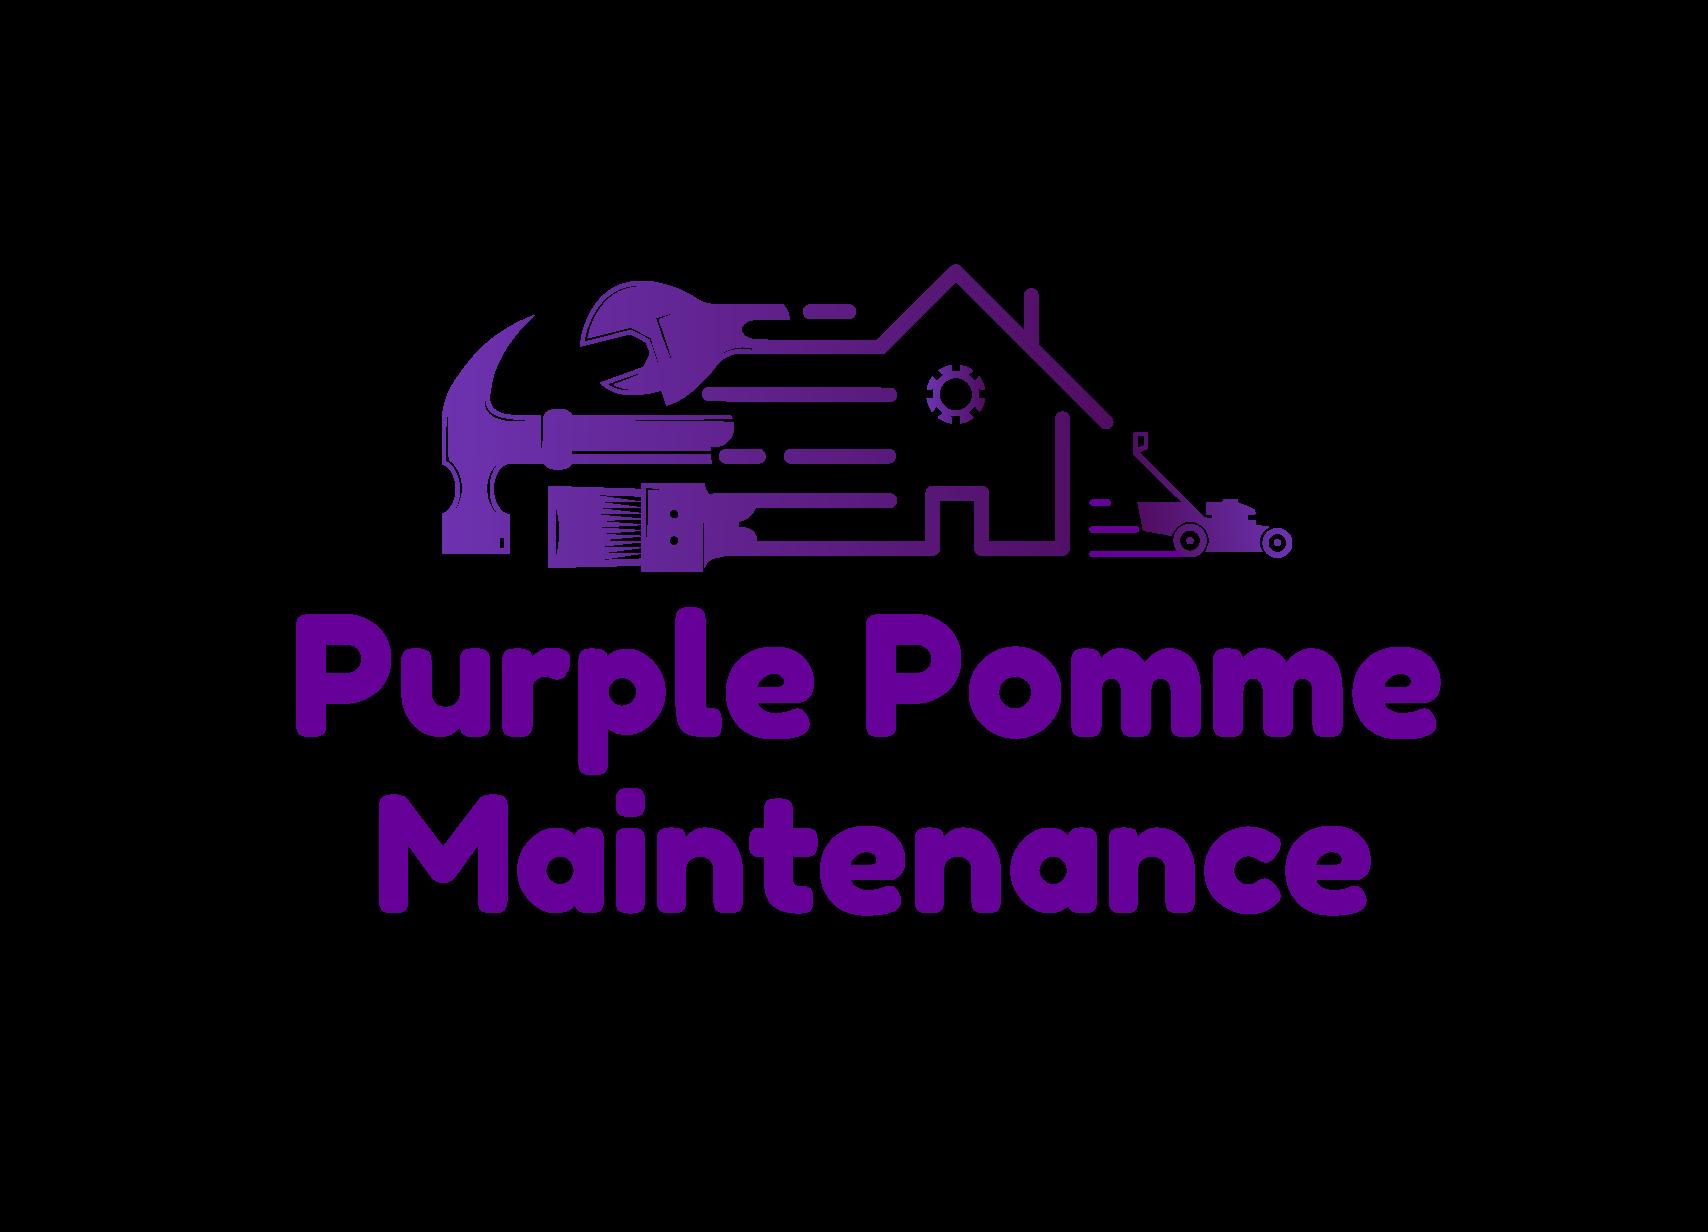 Purple Pomme